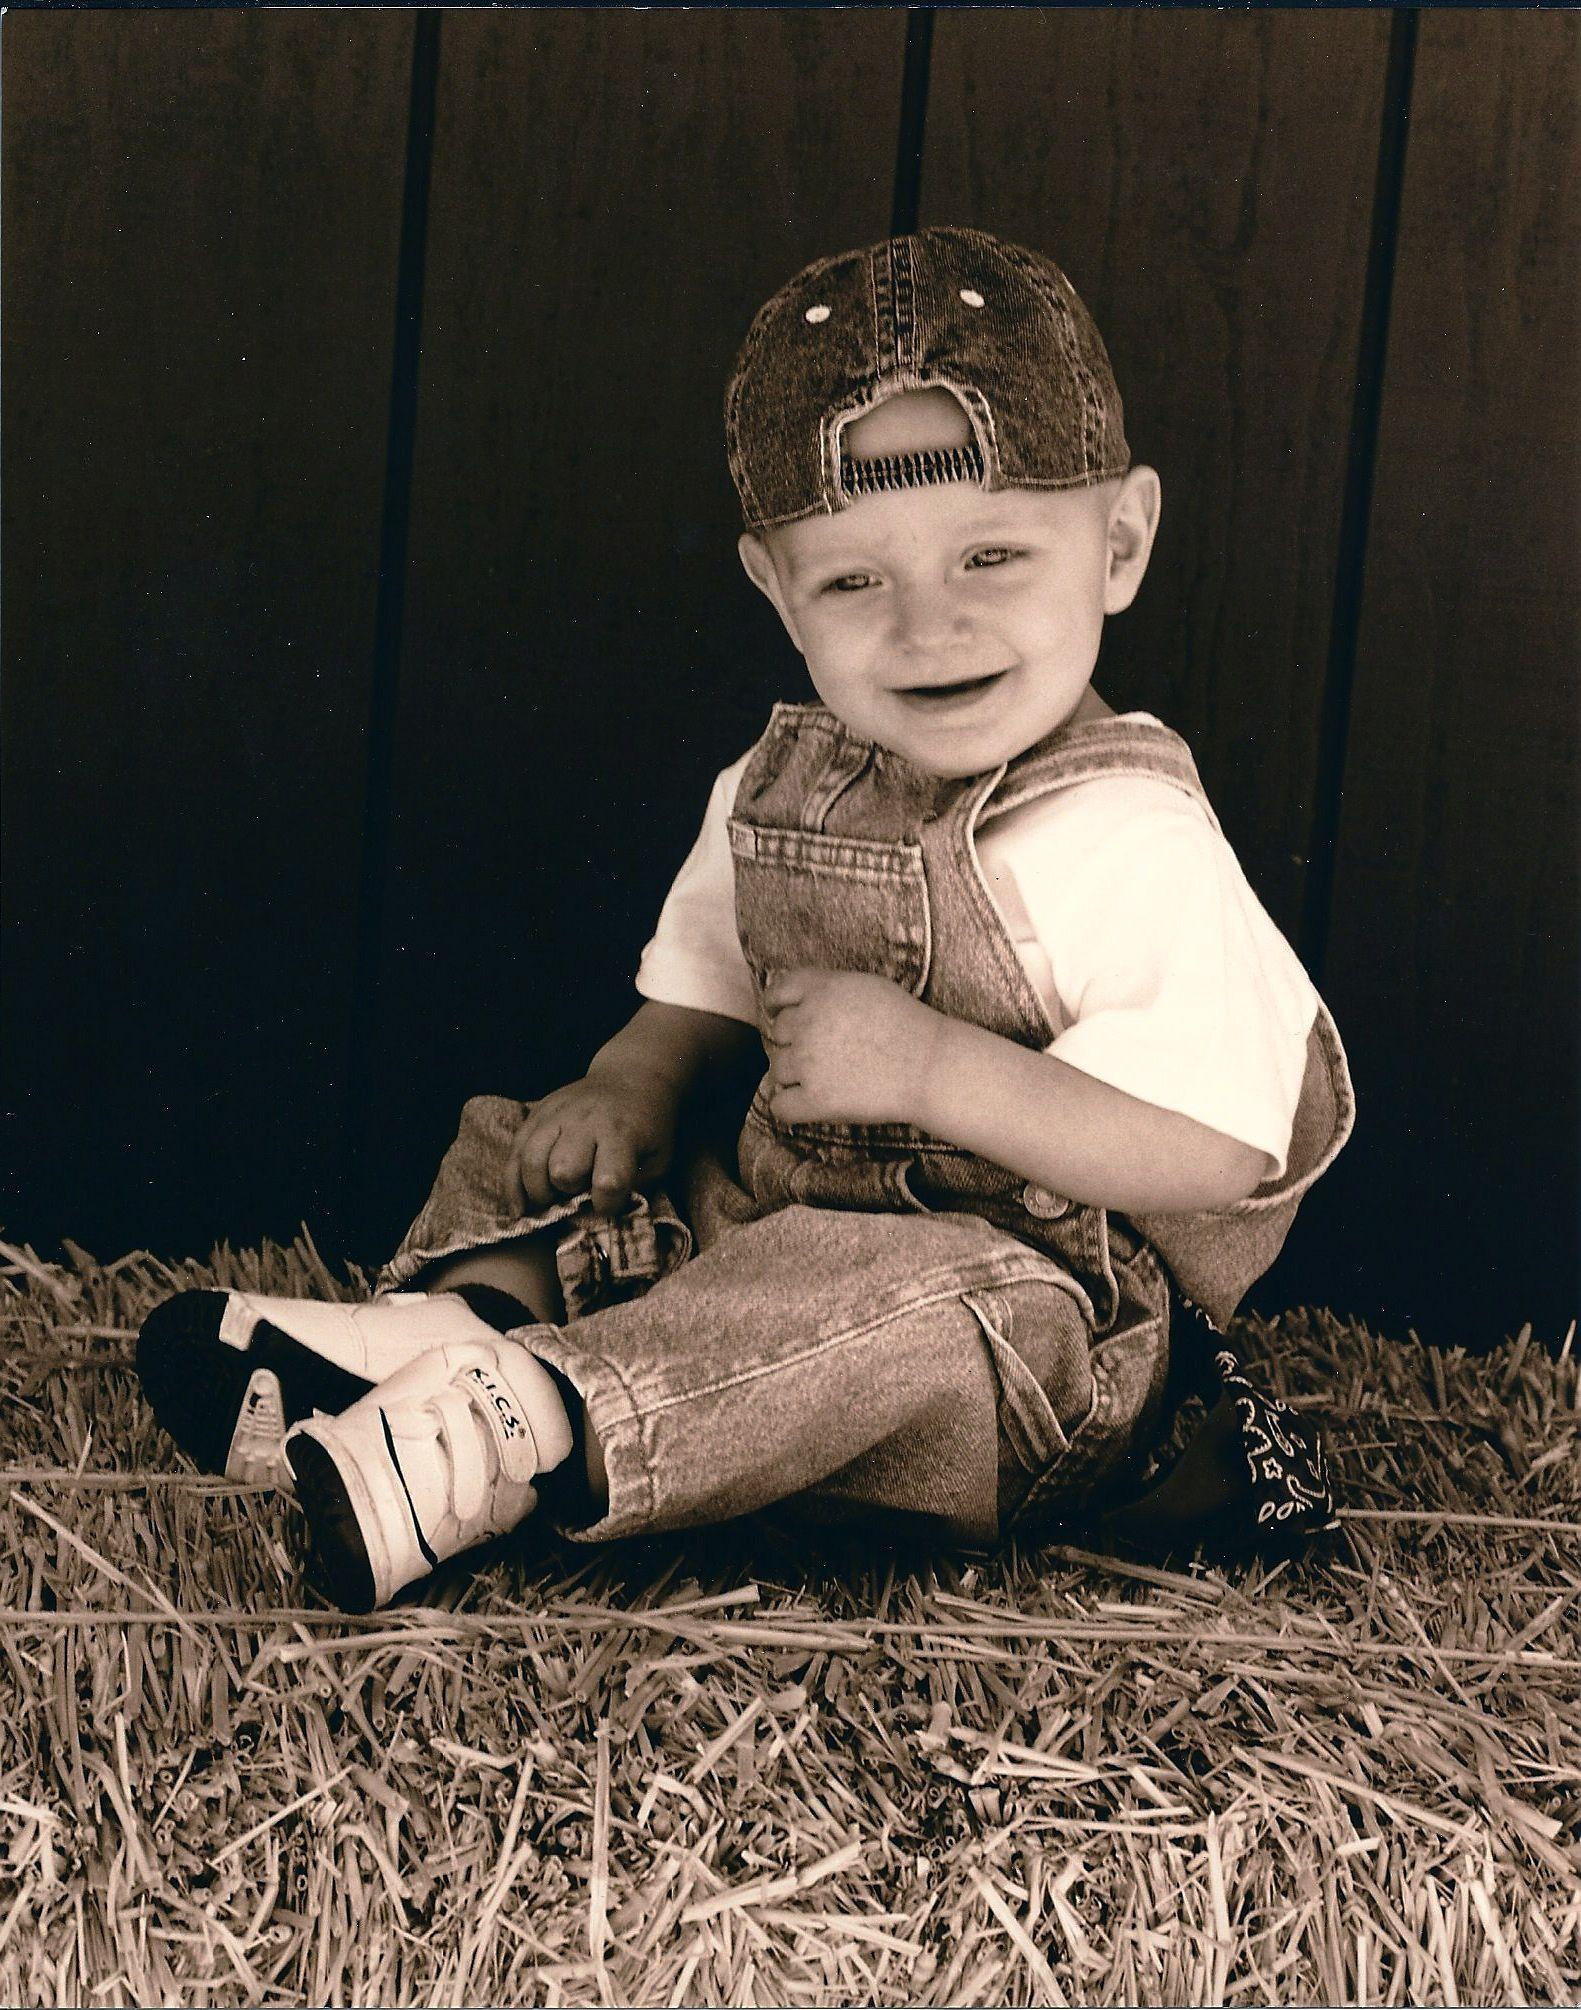 GARRETT 9months Love my Little Farmer, one of my Favorite Pictures ...